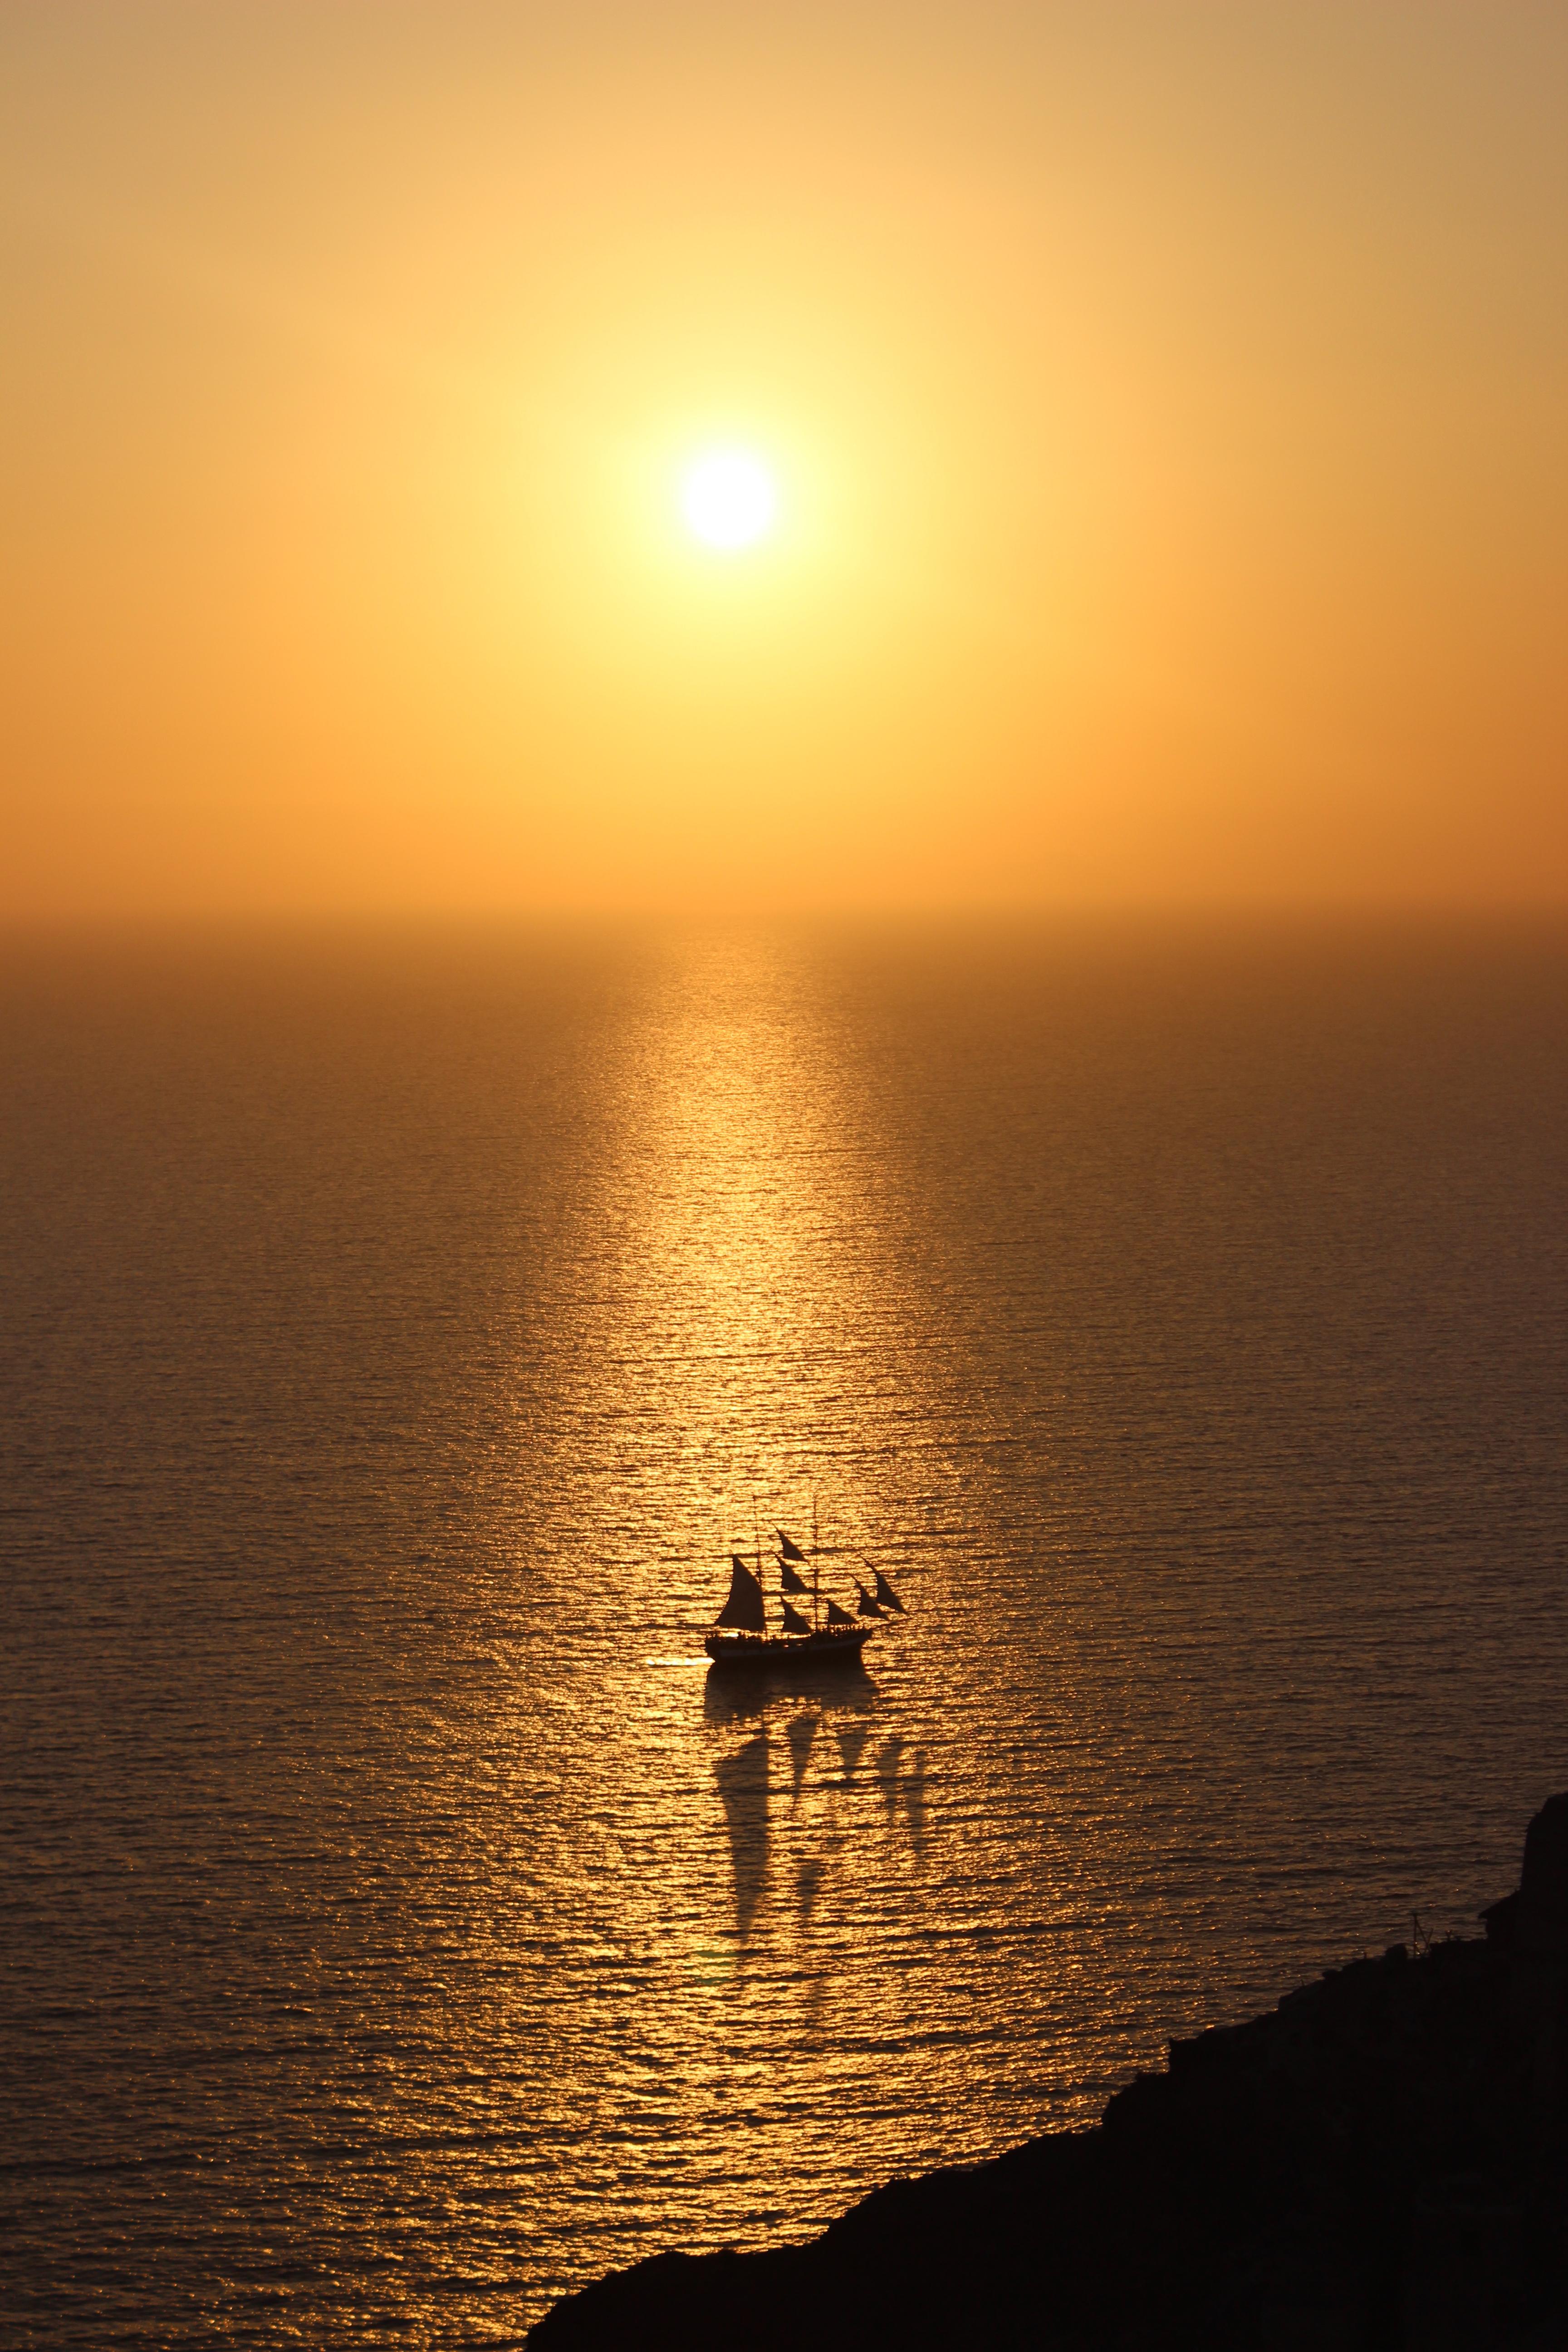 31. Epic Sunset in Oia - Santorini